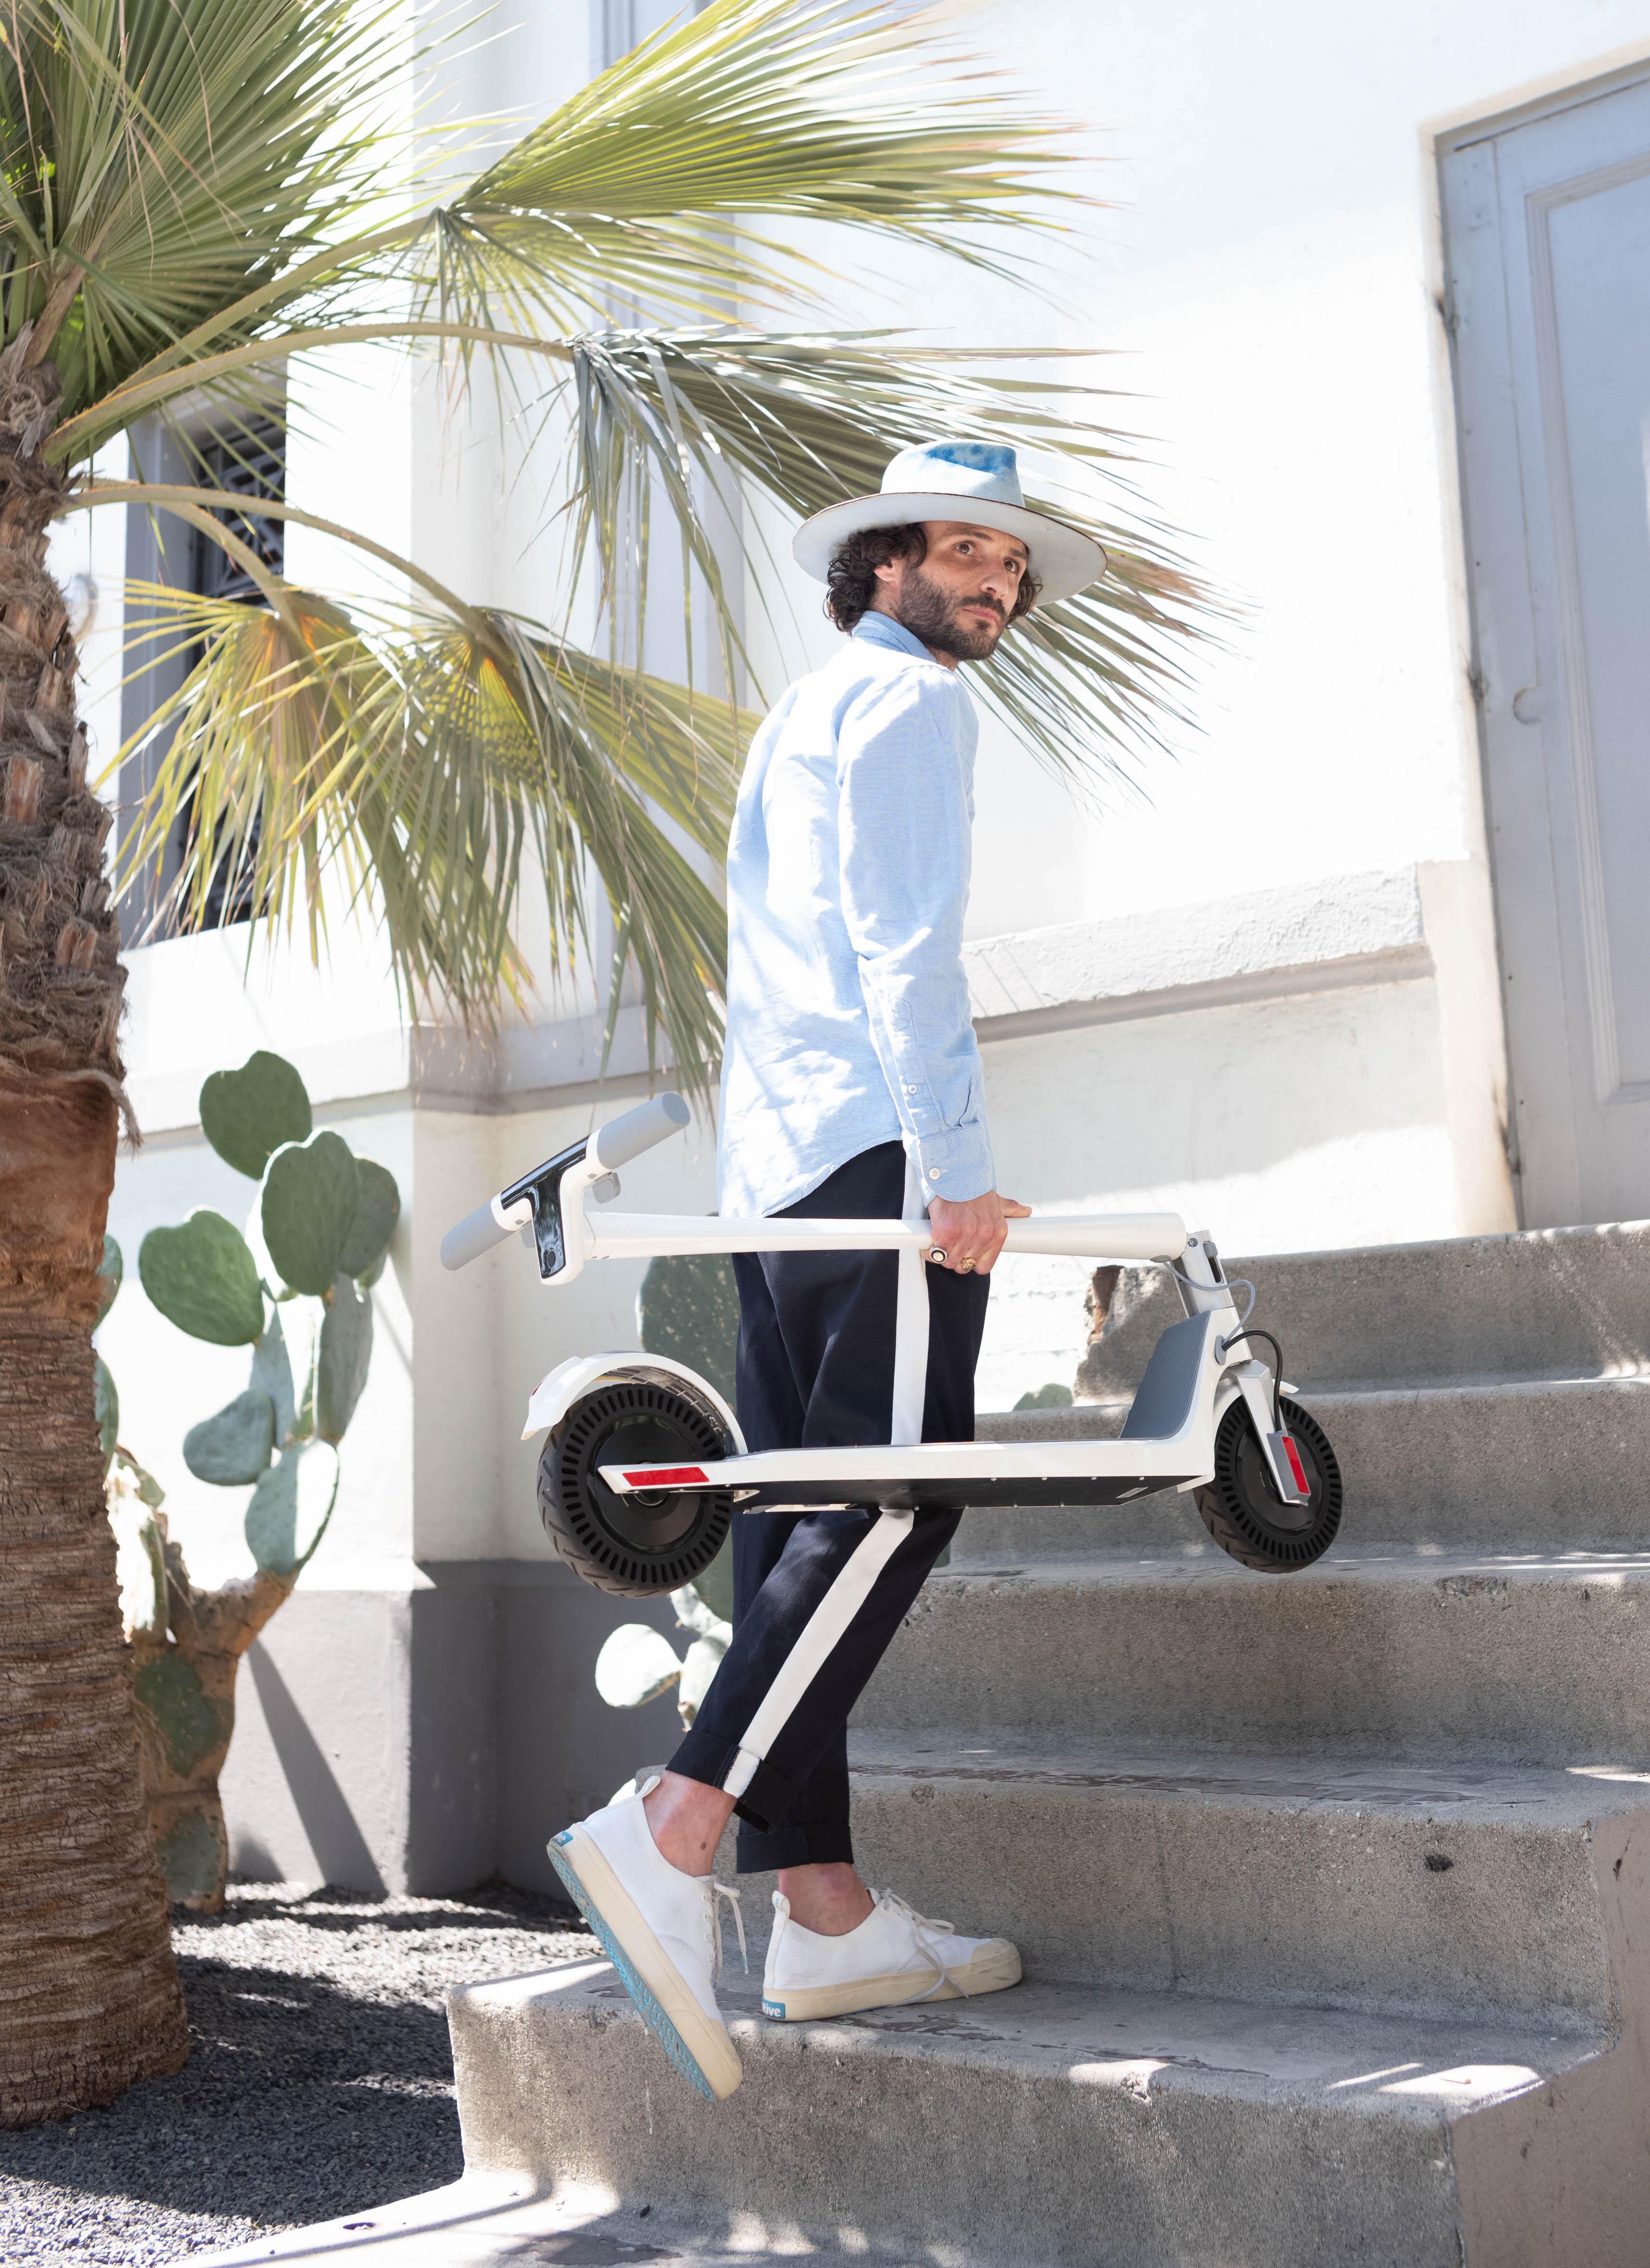 Unagi Scooter Weight 1